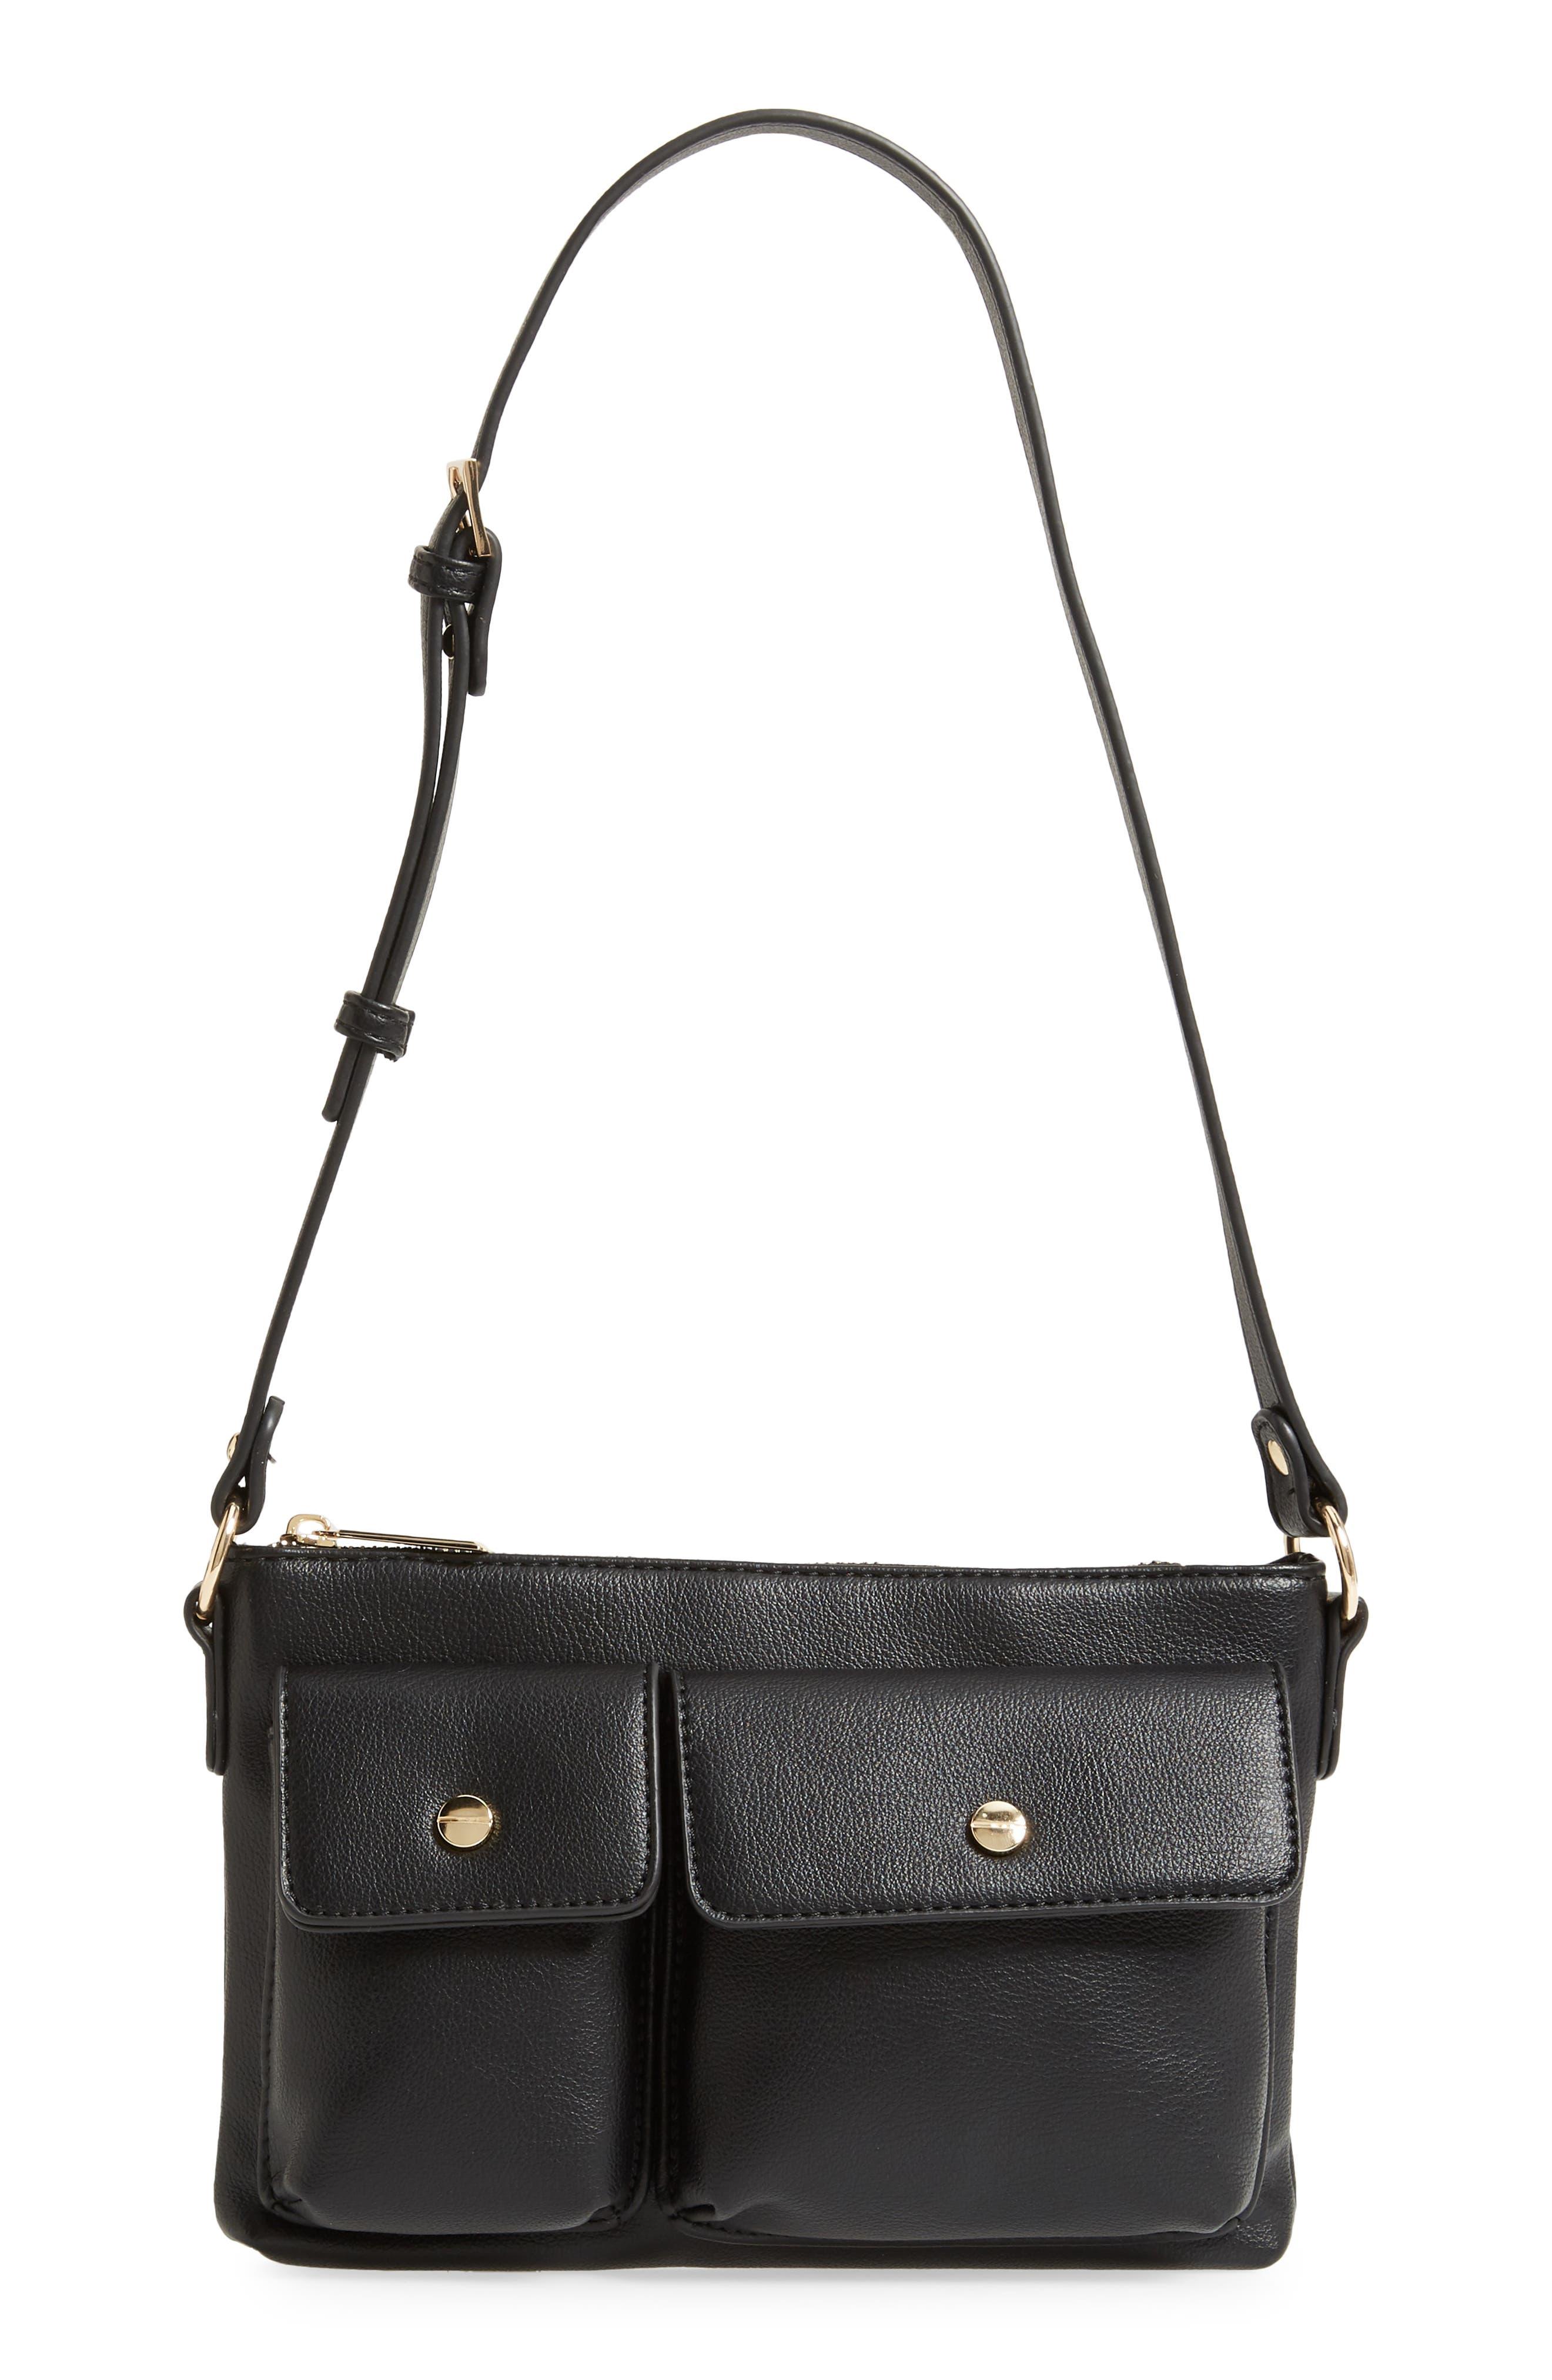 Mali + Lili Miya Double Pocket Vegan Leather Convertible Shoulder Bag